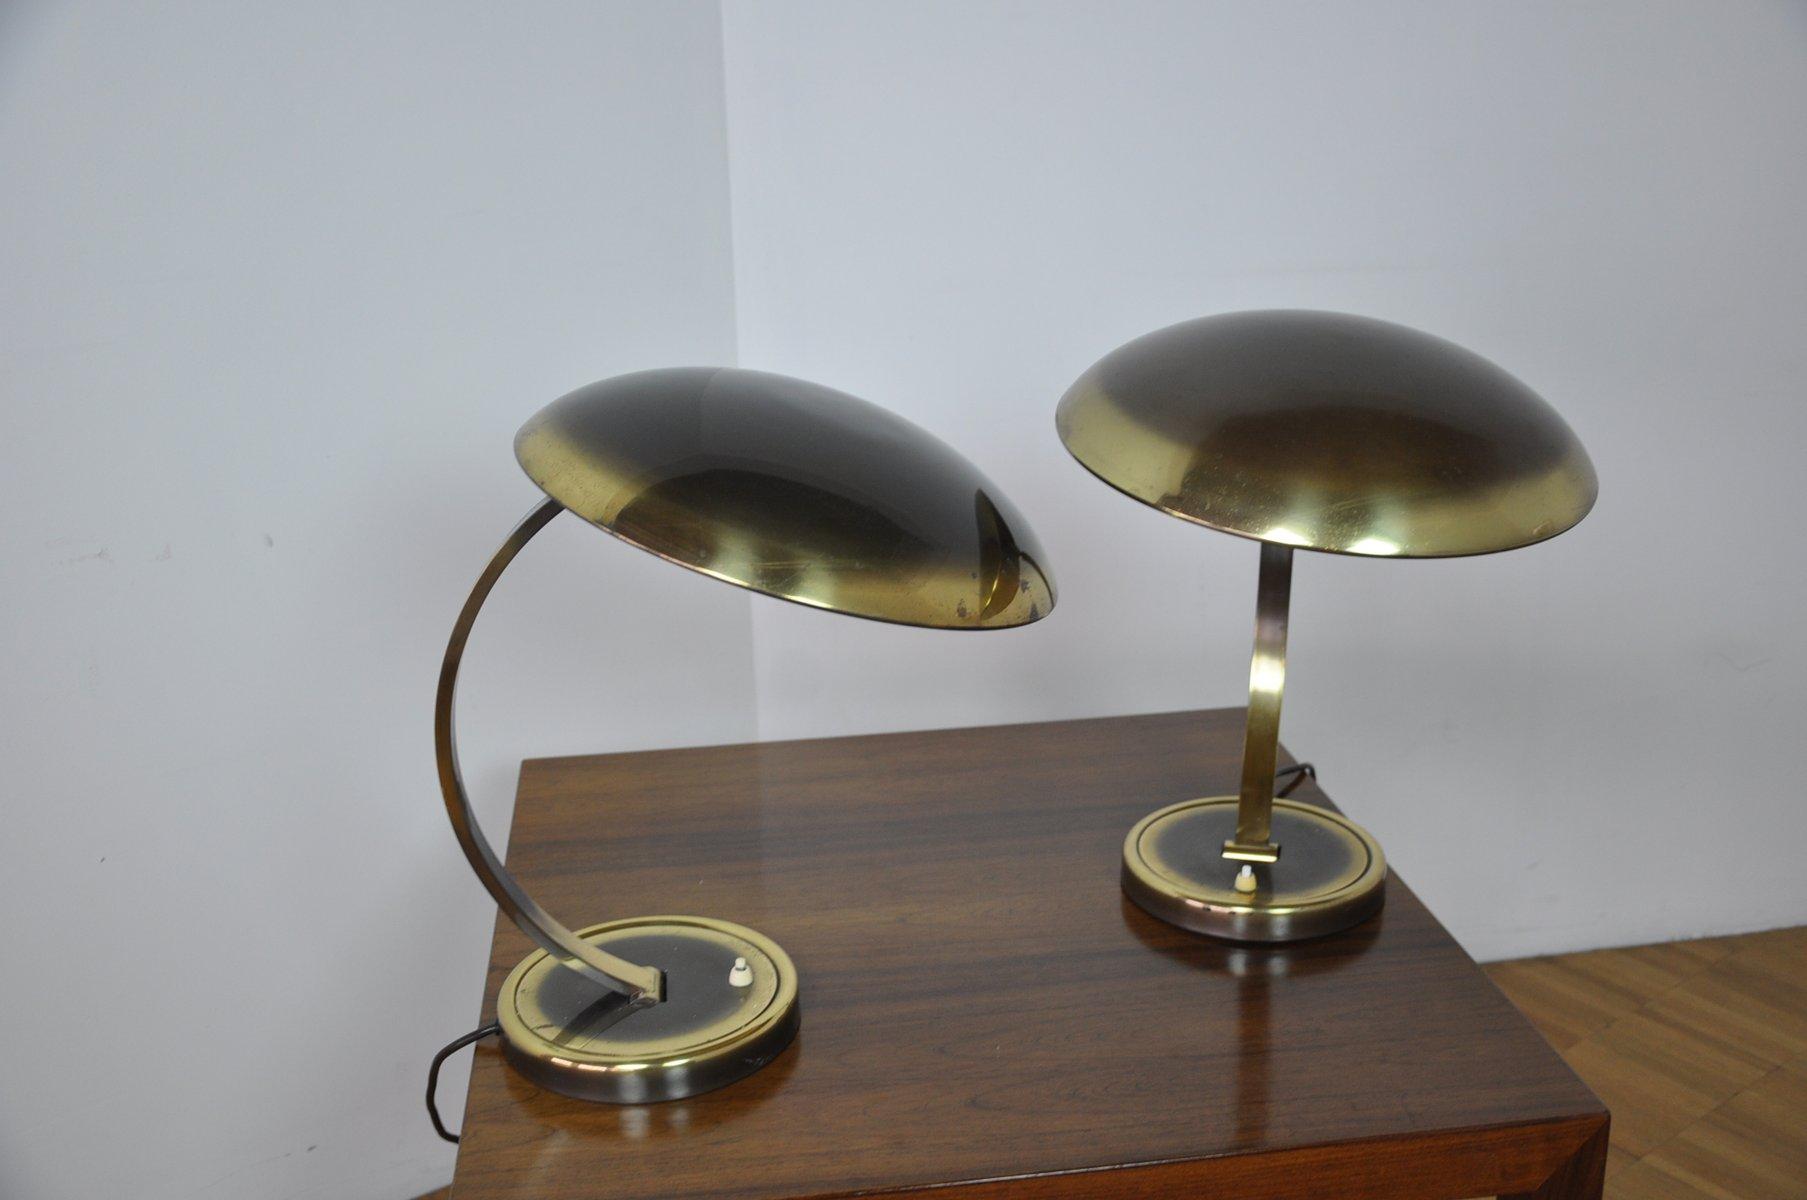 german brass desk lamp by christian dell for kaiser idell. Black Bedroom Furniture Sets. Home Design Ideas